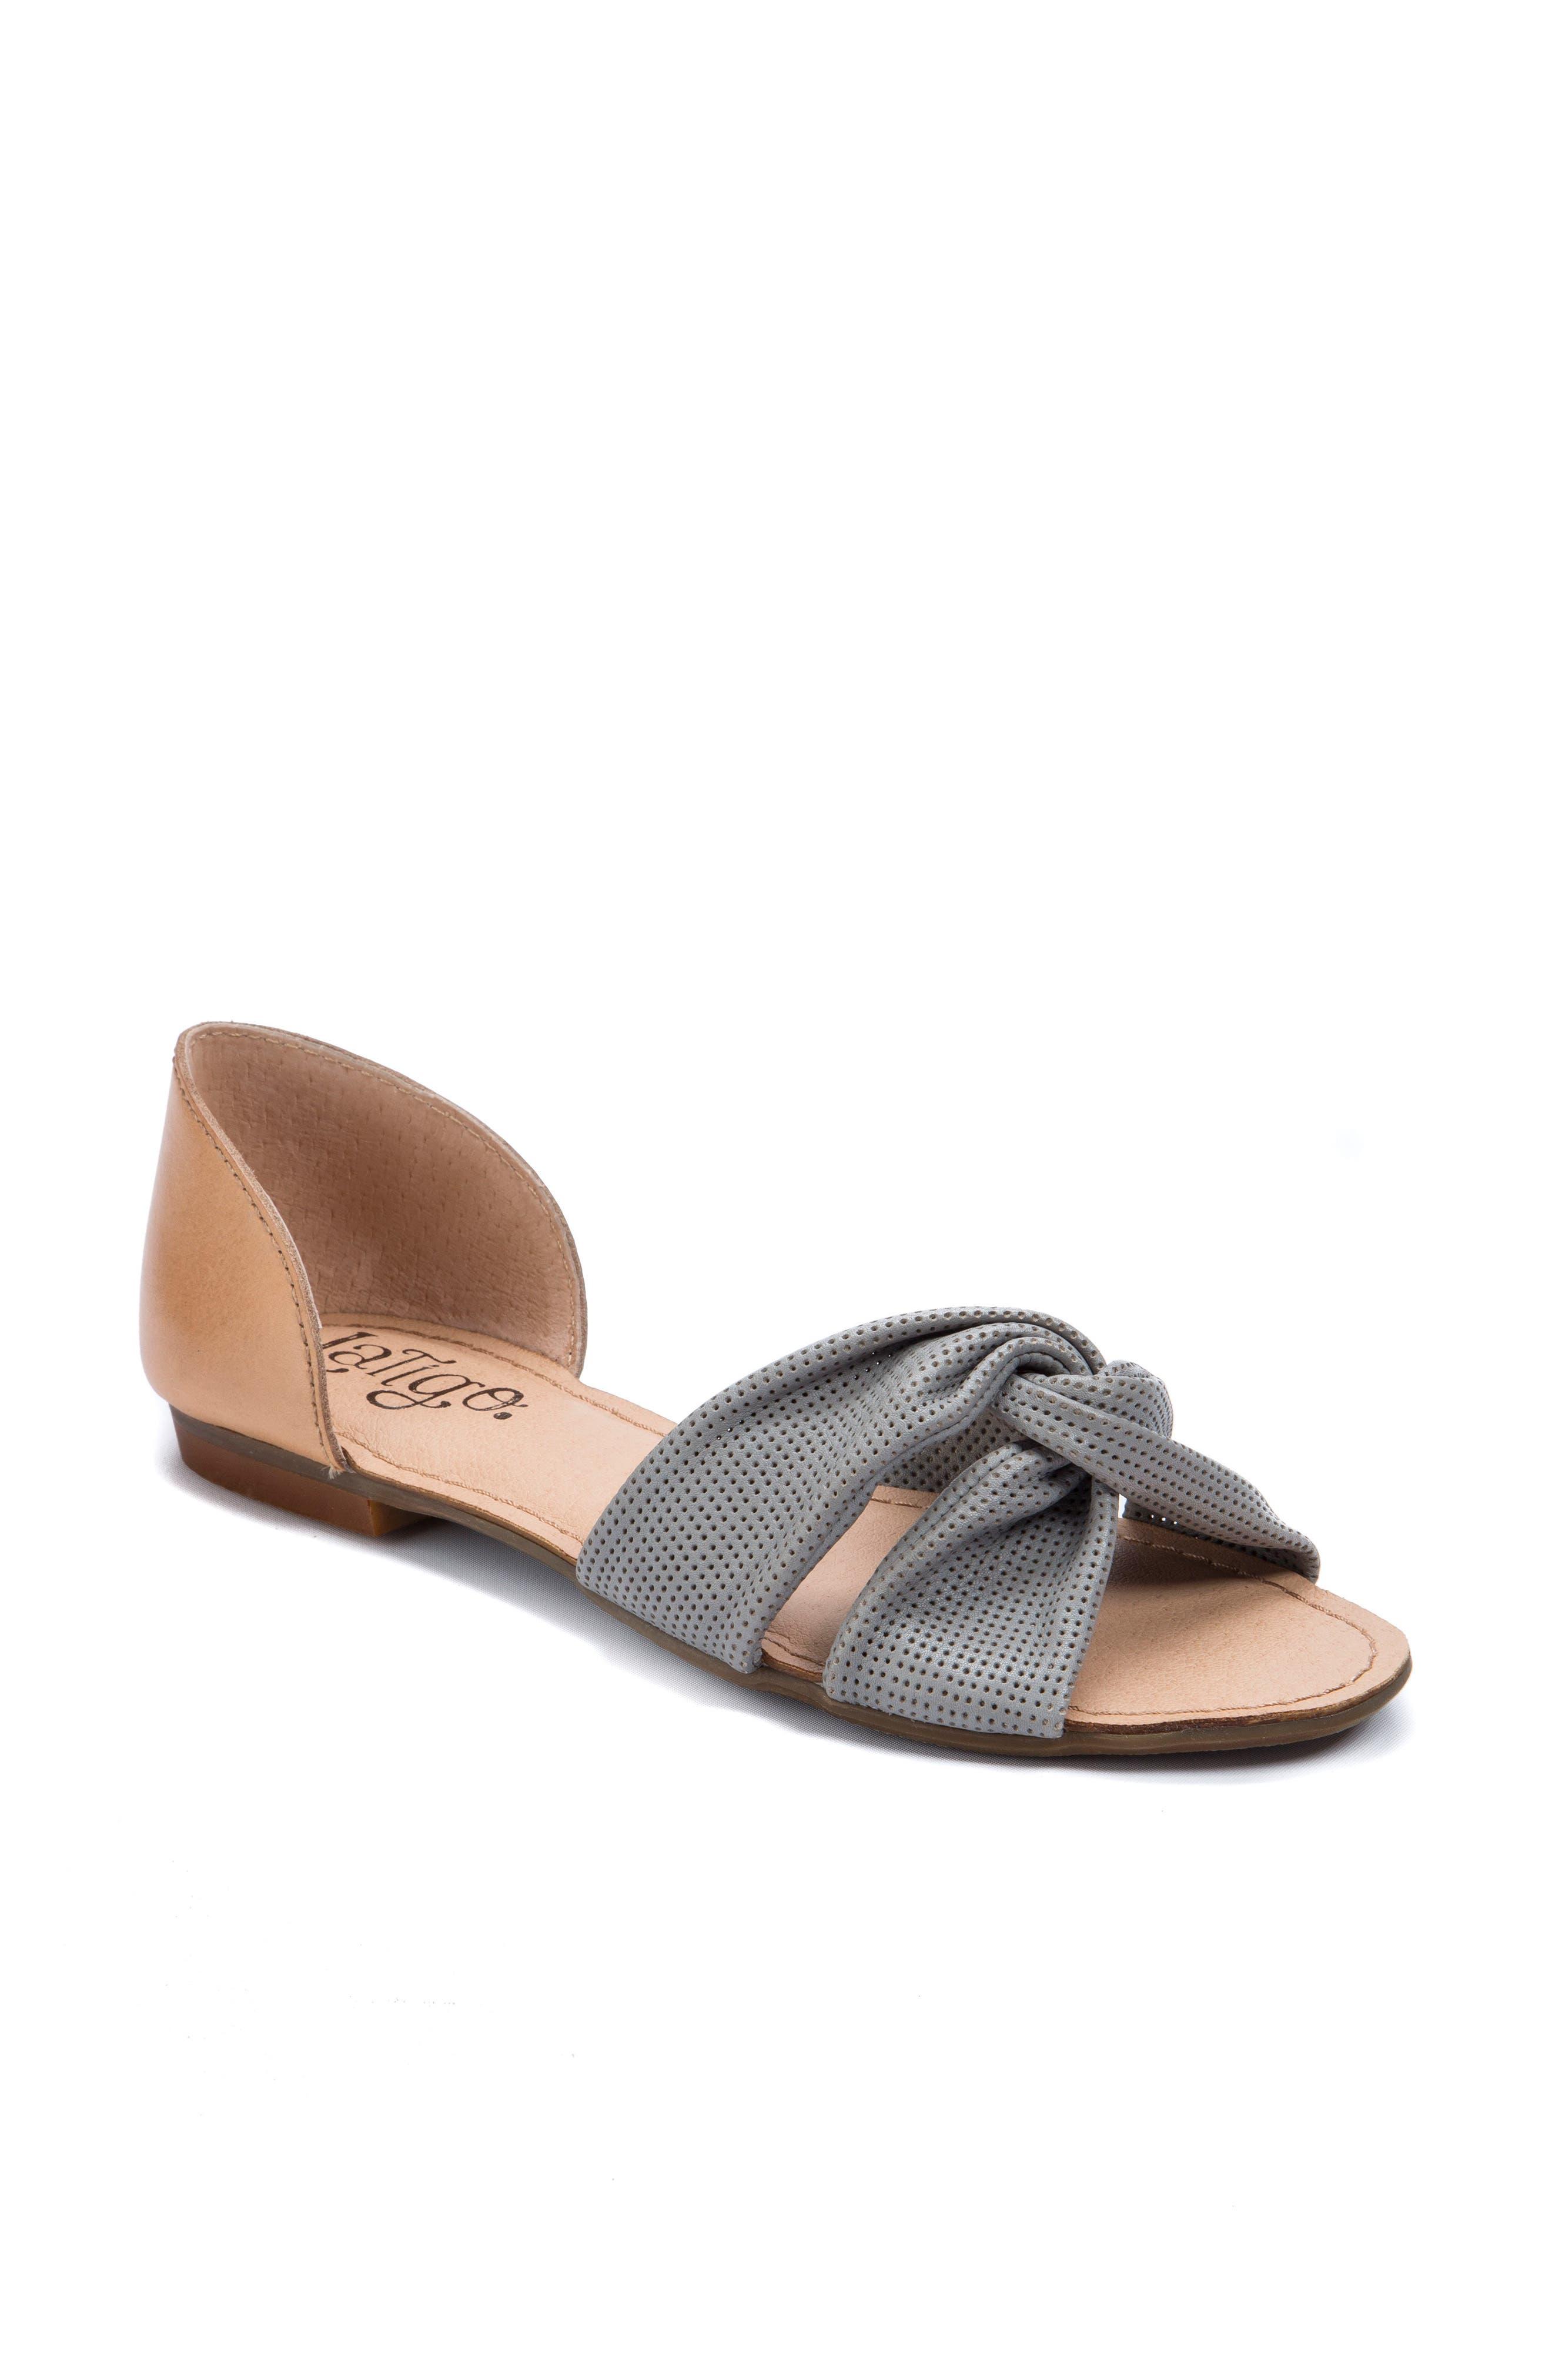 Darcy Perforated Flat Sandal,                             Main thumbnail 1, color,                             020